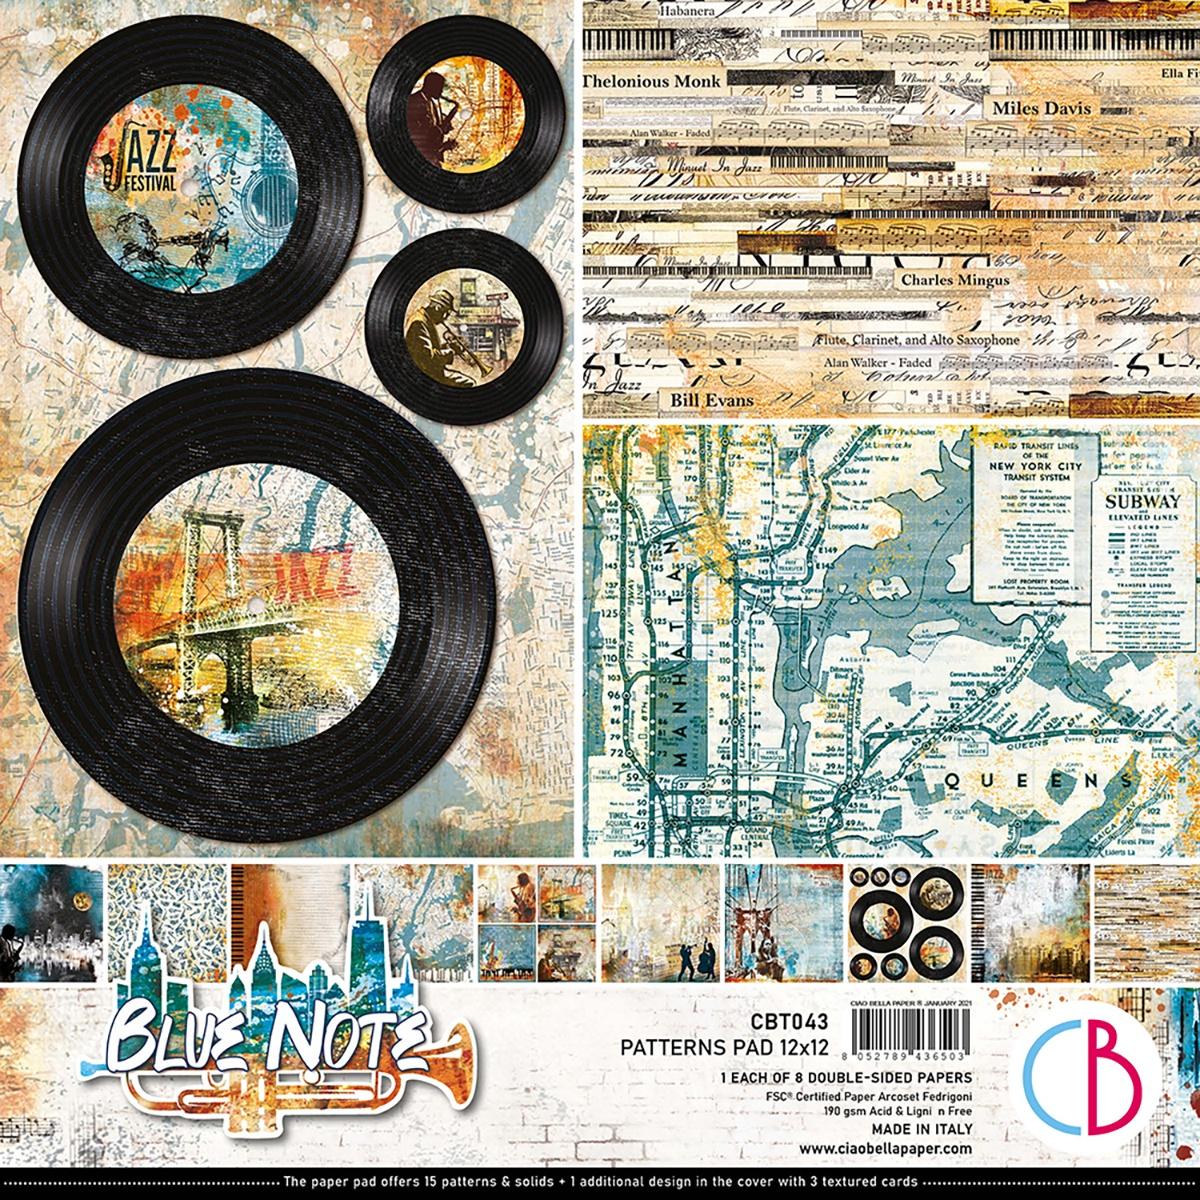 Ciao Bella - Blue Note - 12x12 Patterns Pad